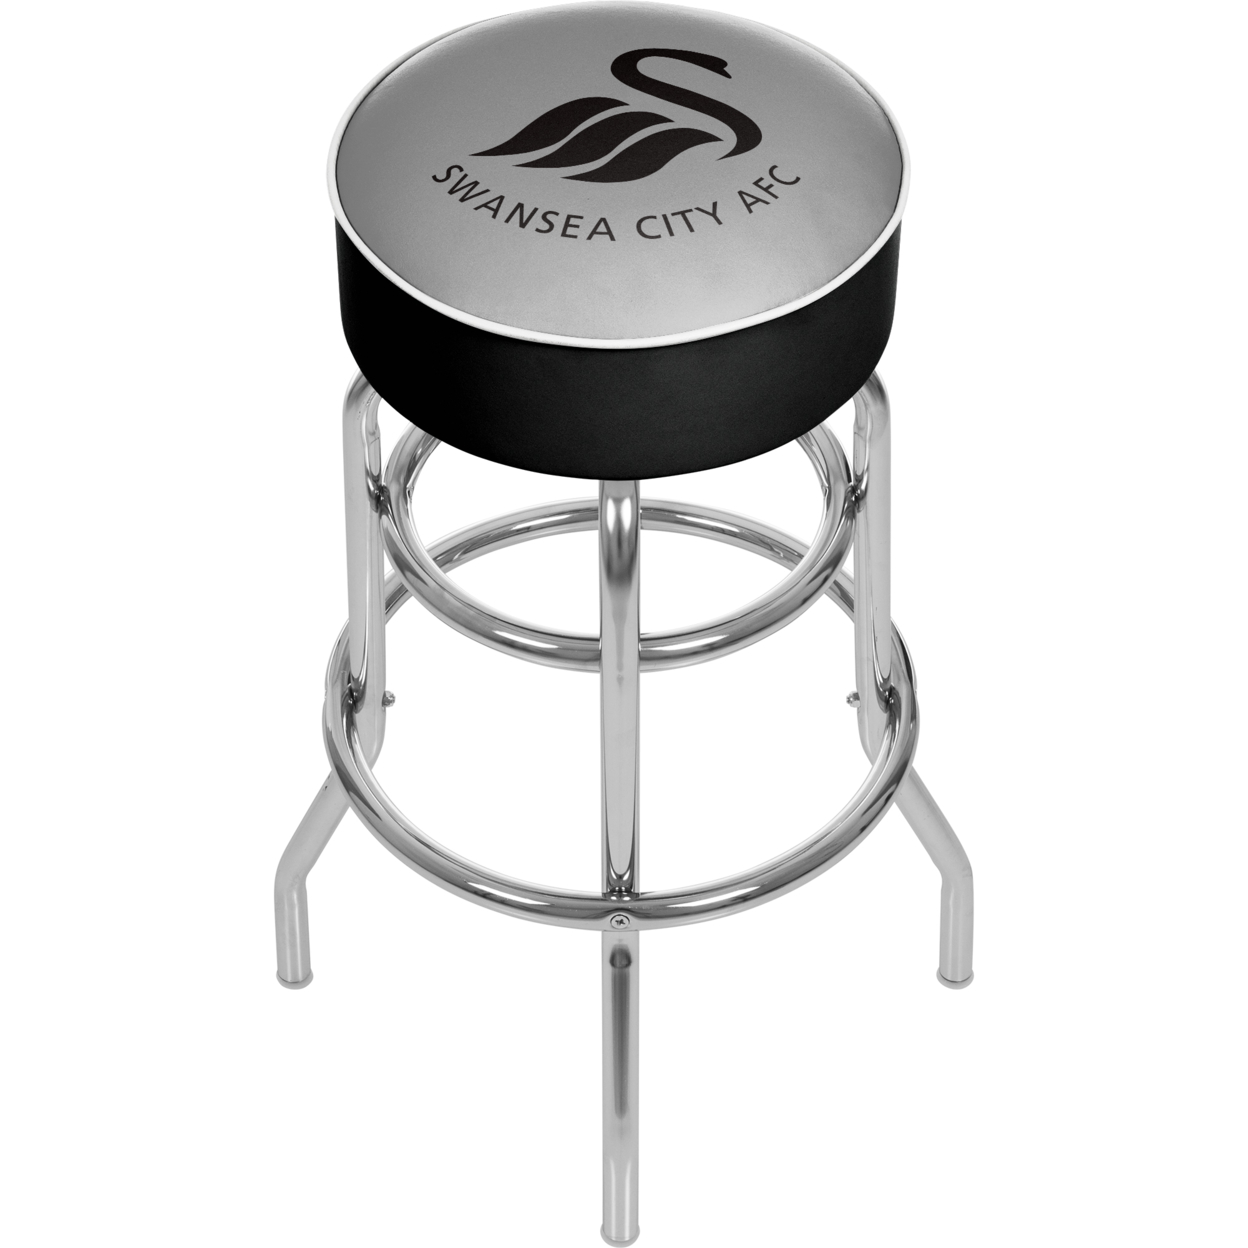 Premier League Swansea City Padded Swivel Bar Stool 30 Inches High premier league liverpool football club chrome 42 inch pub table